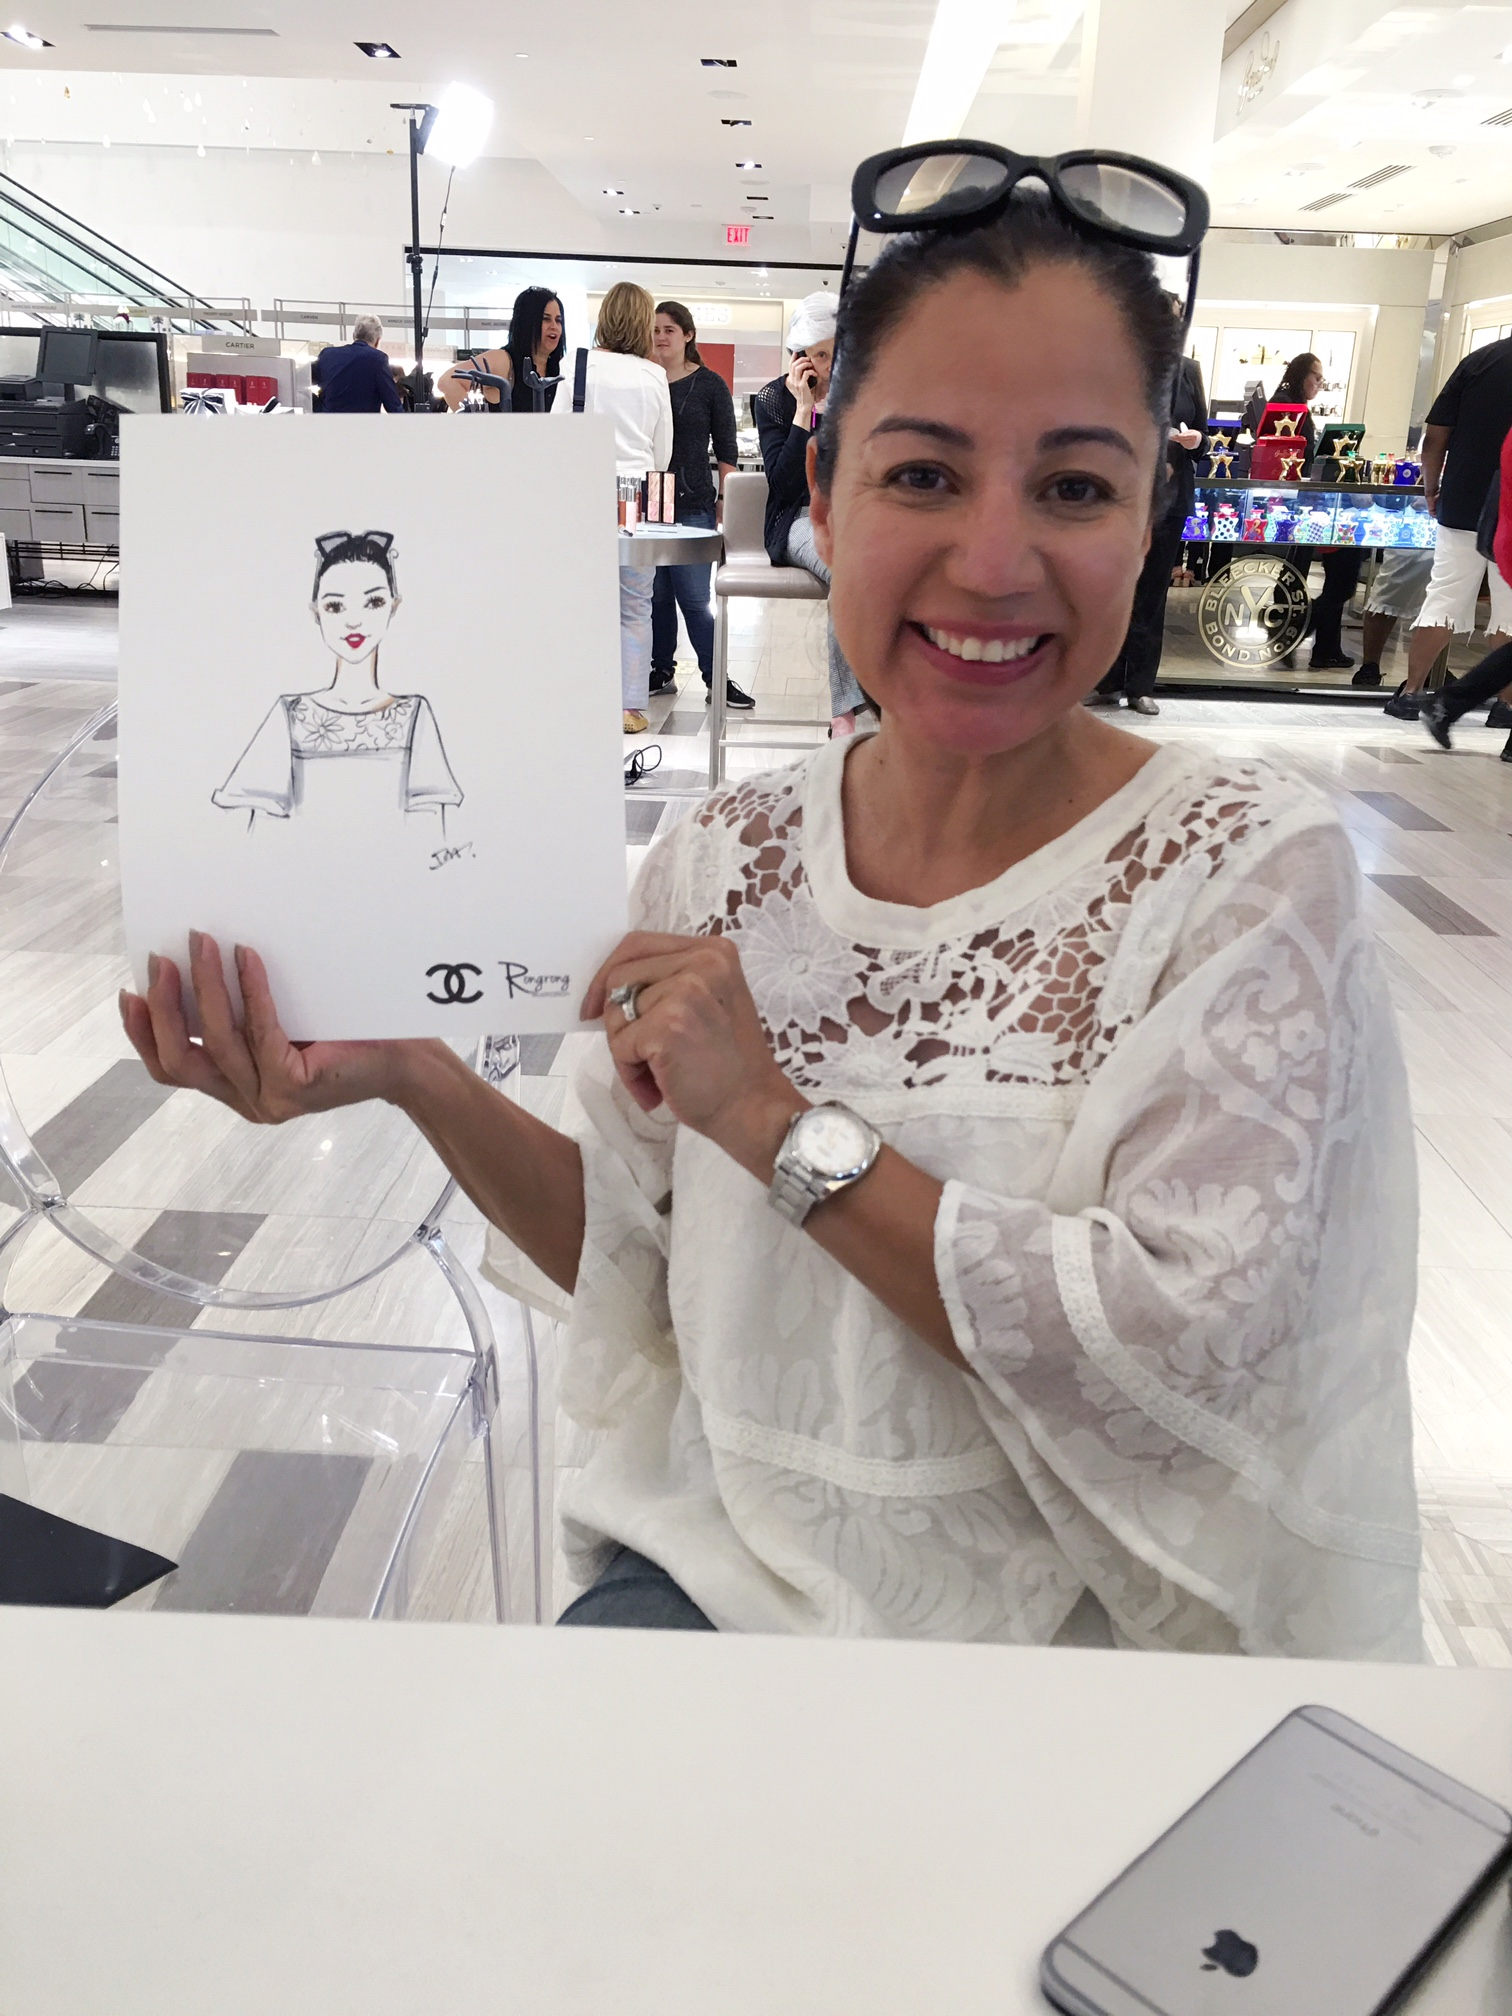 She is a huge Chanel fan! We agreed that when in doubt, choose Chanel!